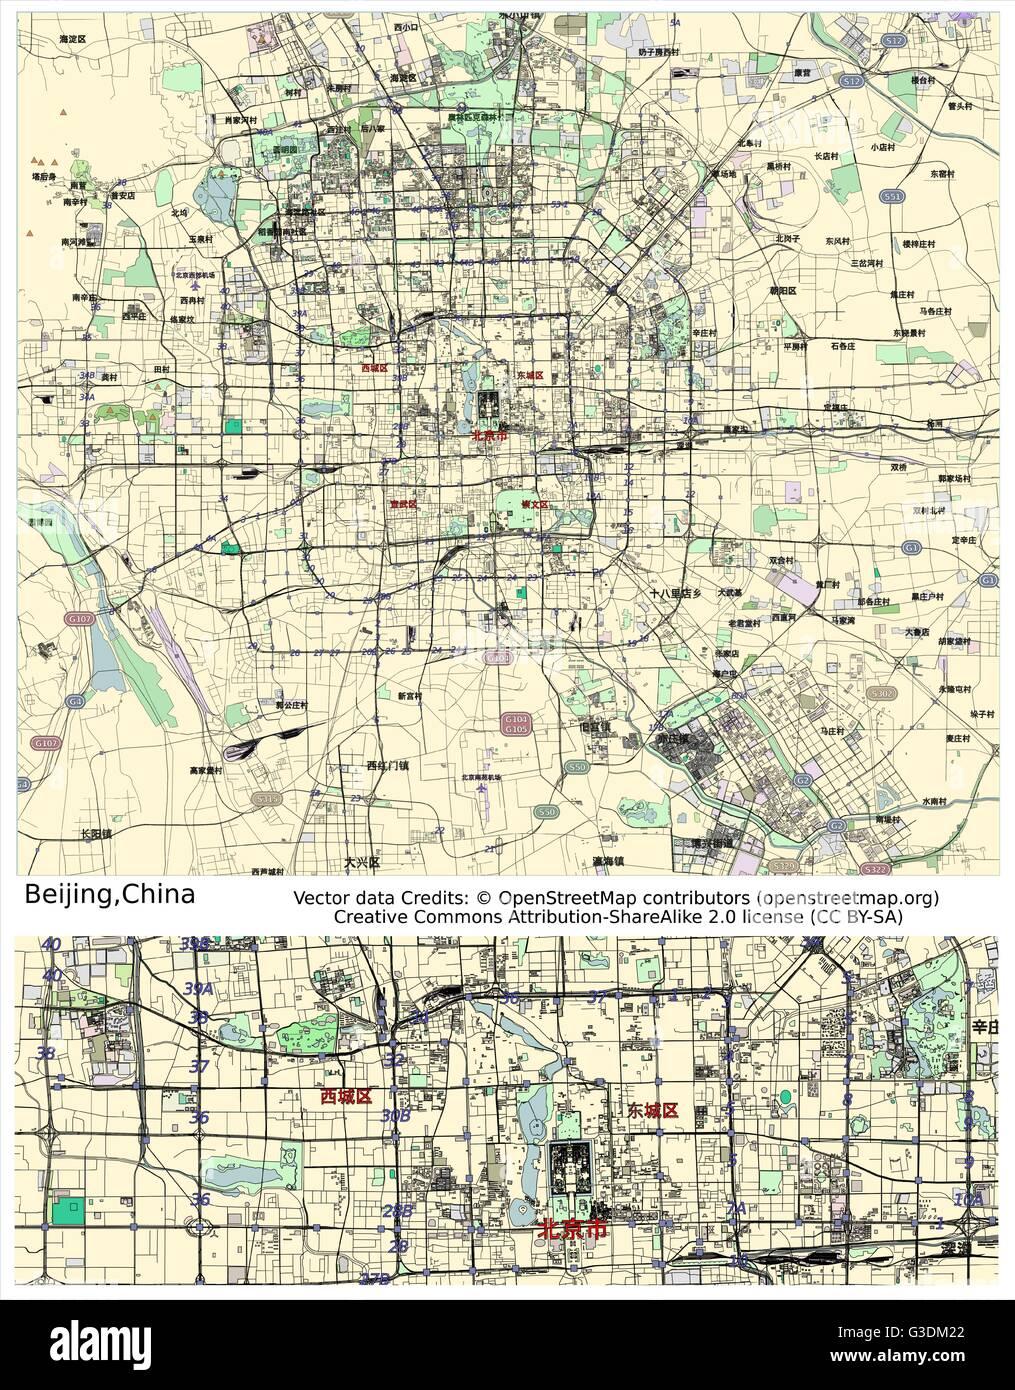 Beijing China city map - Stock Image